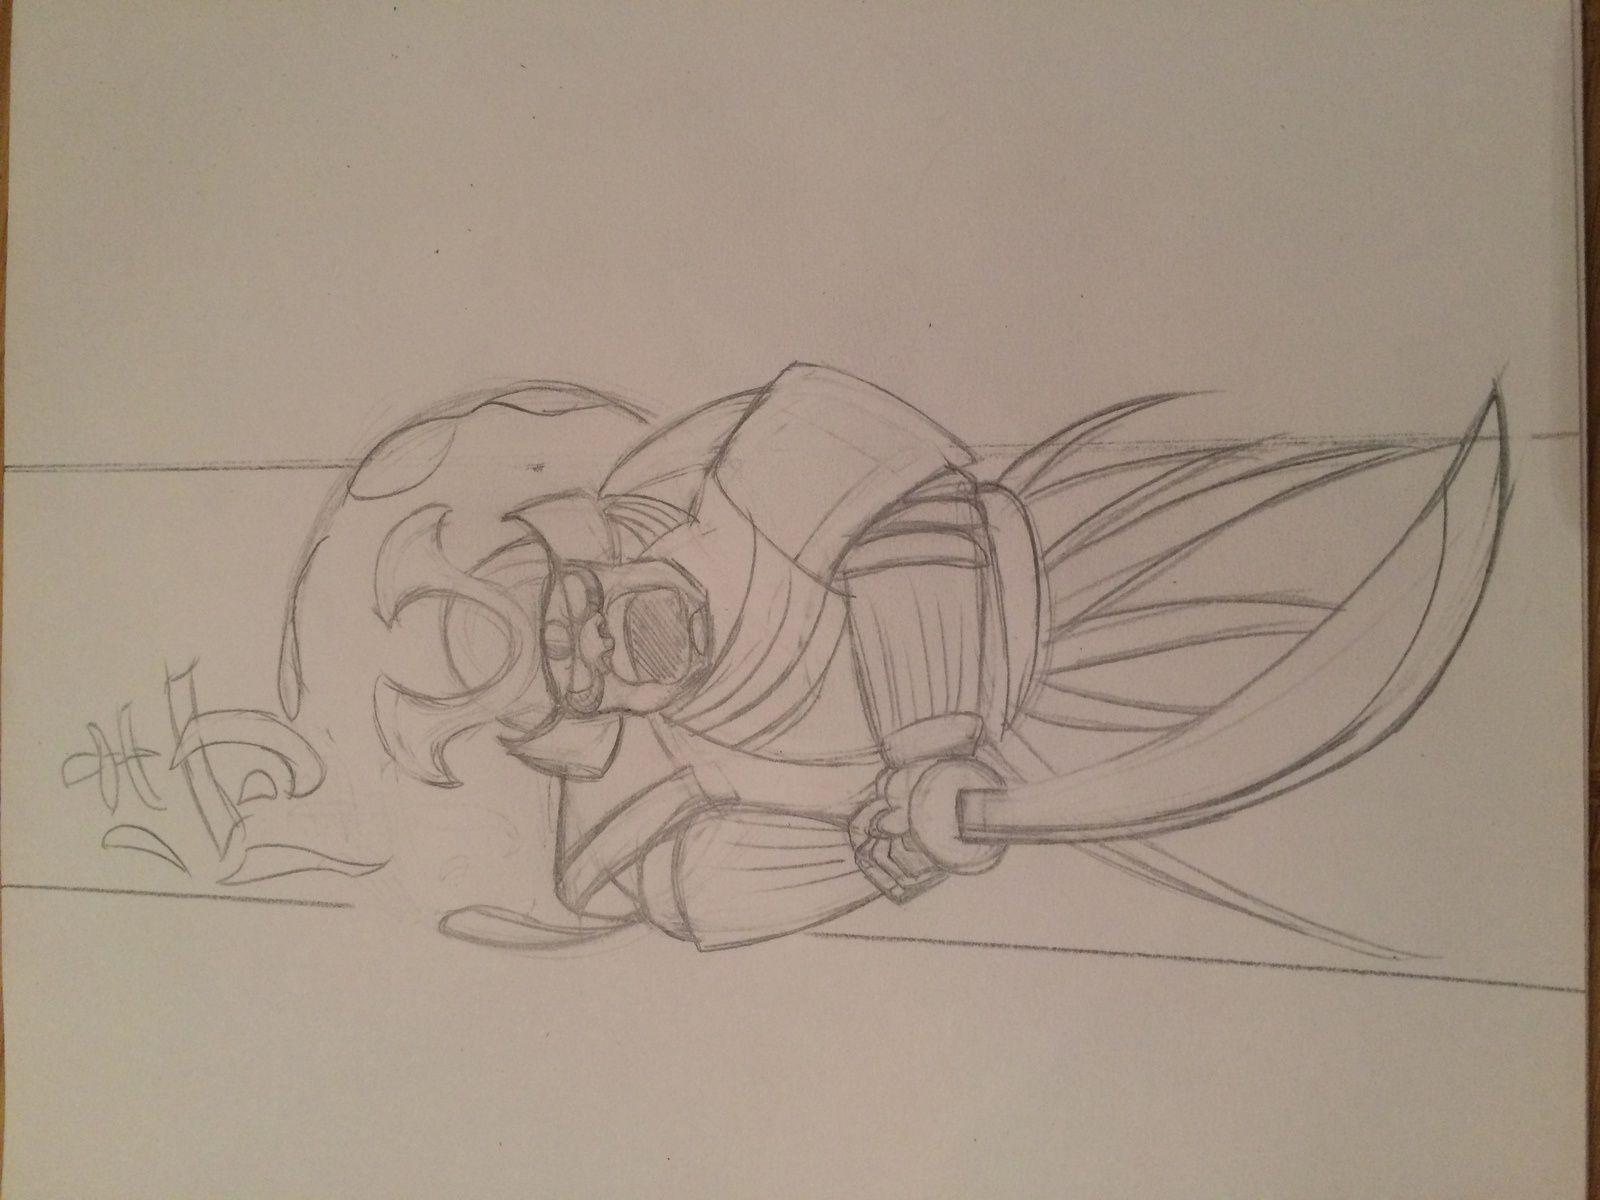 dessin du samouraï au crayon HB